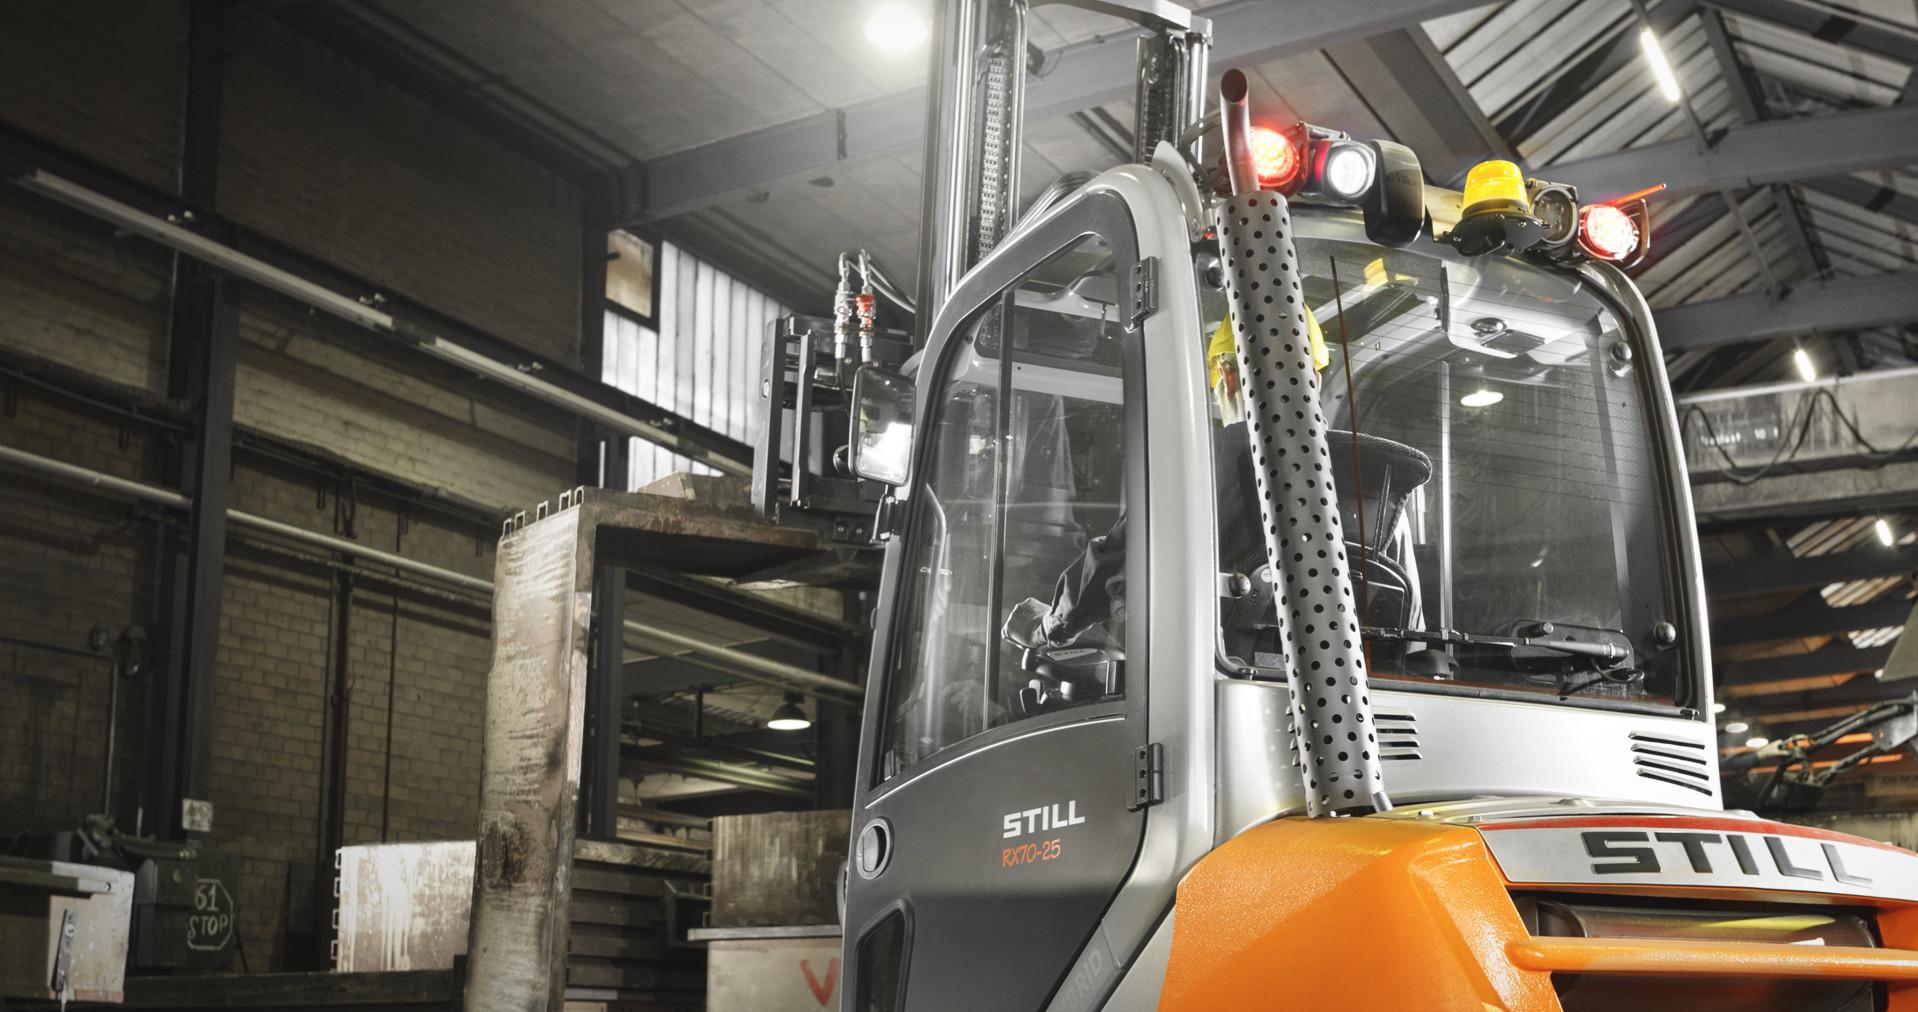 /products/Service/Safety/Exhaust_Inspection/images/STILL_Grafikproduktion_Abgaspruefung_4K.jpg